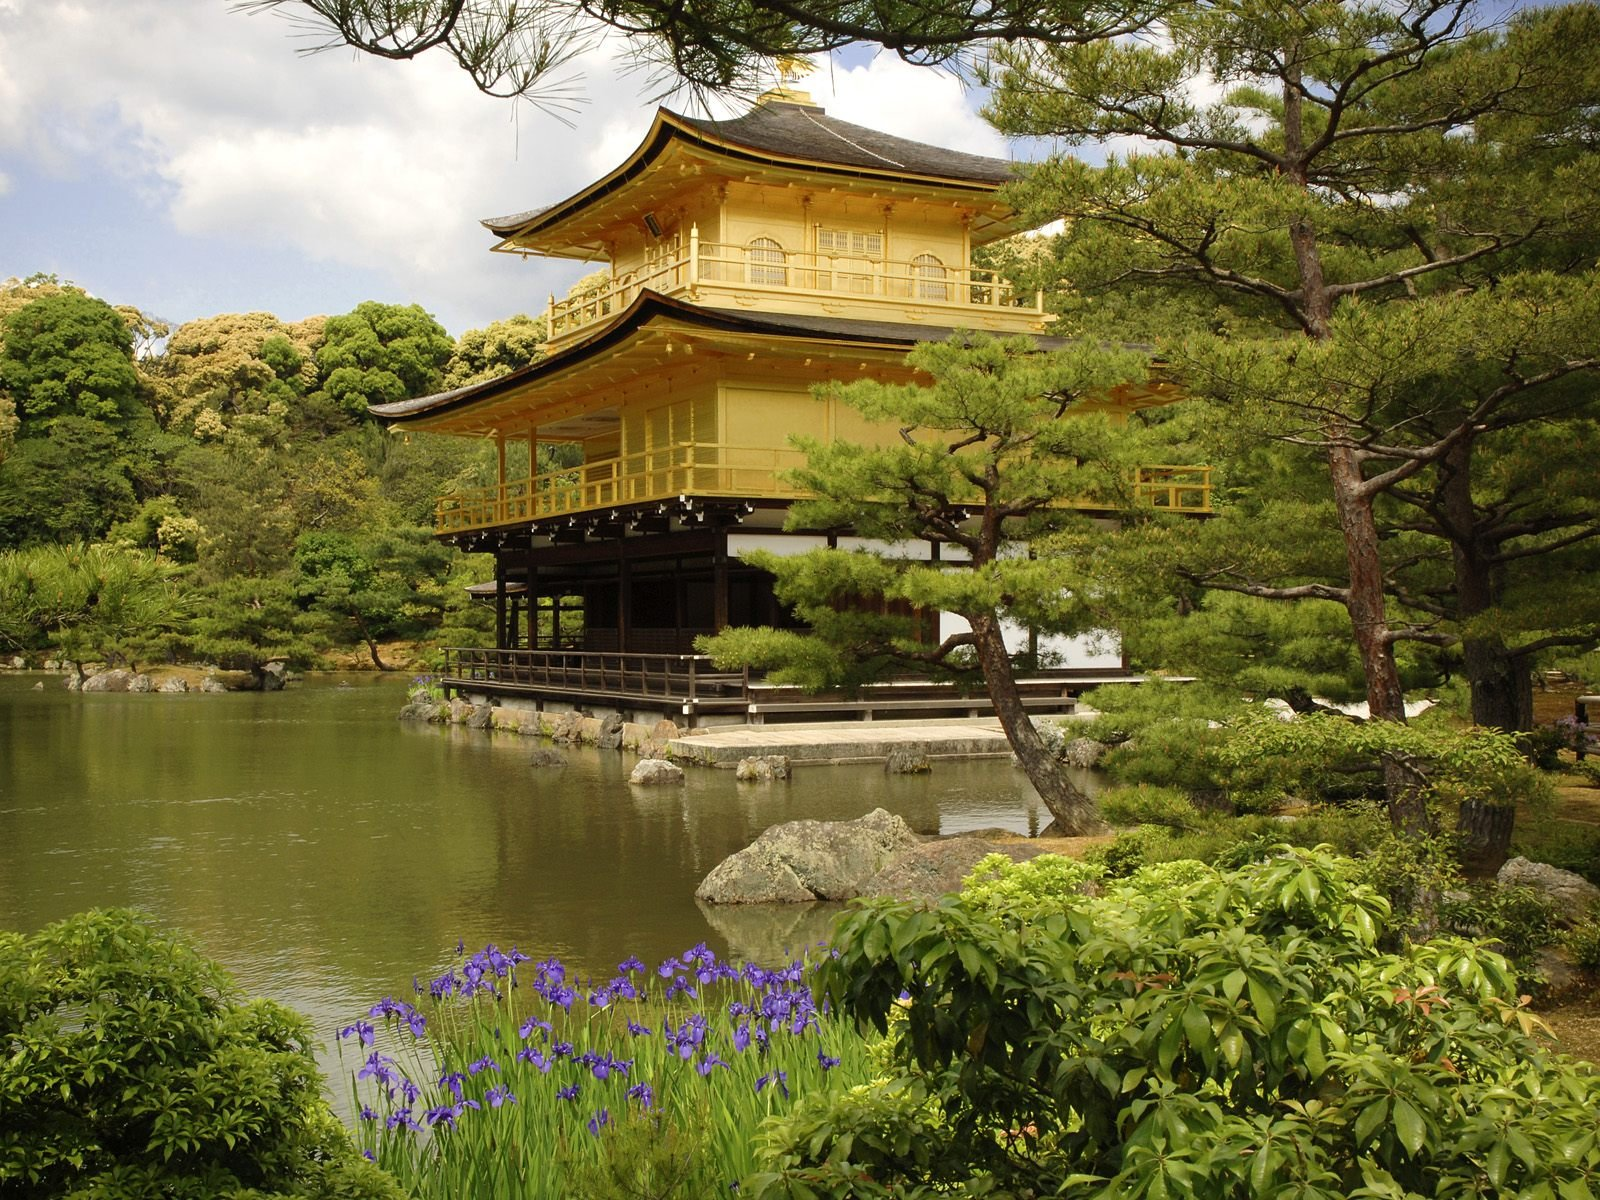 Kinkaku Ji Temple Kyoto Japan Wallpapers HD Wallpapers 1600x1200